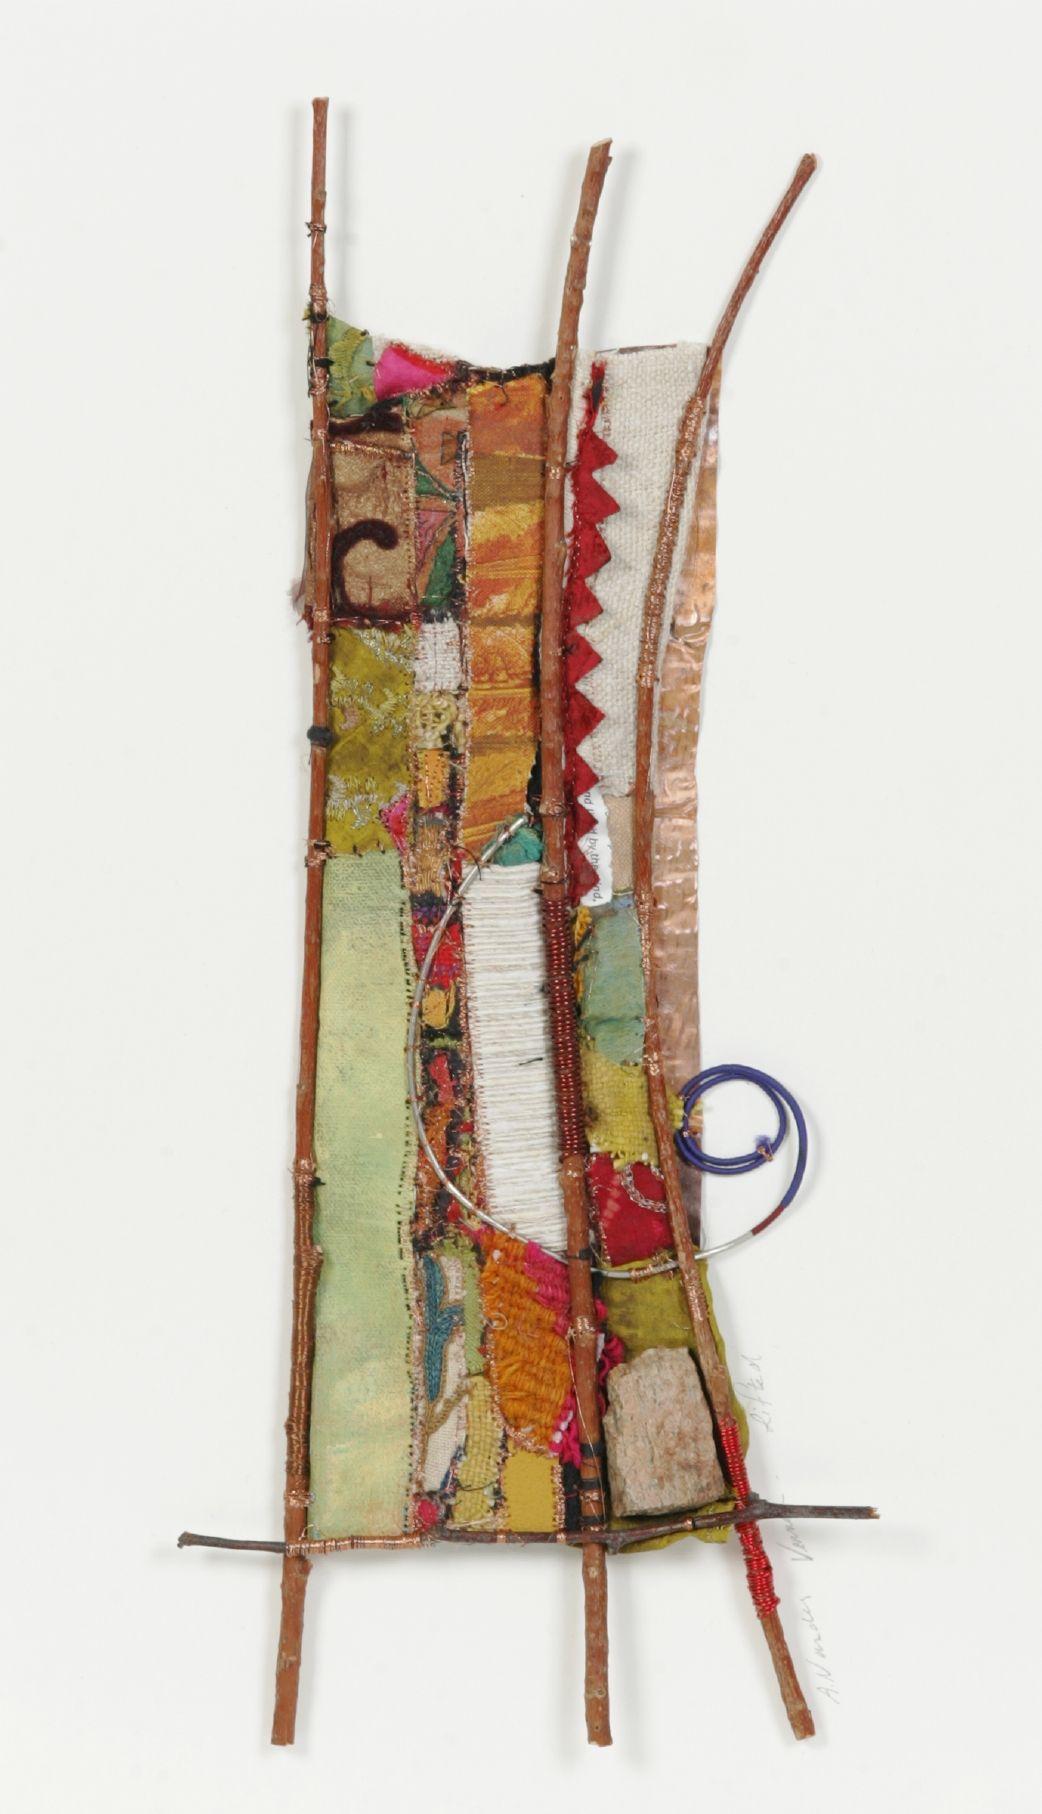 12 X 20; fabric, acrylic paints, stone, copper wire, sticks